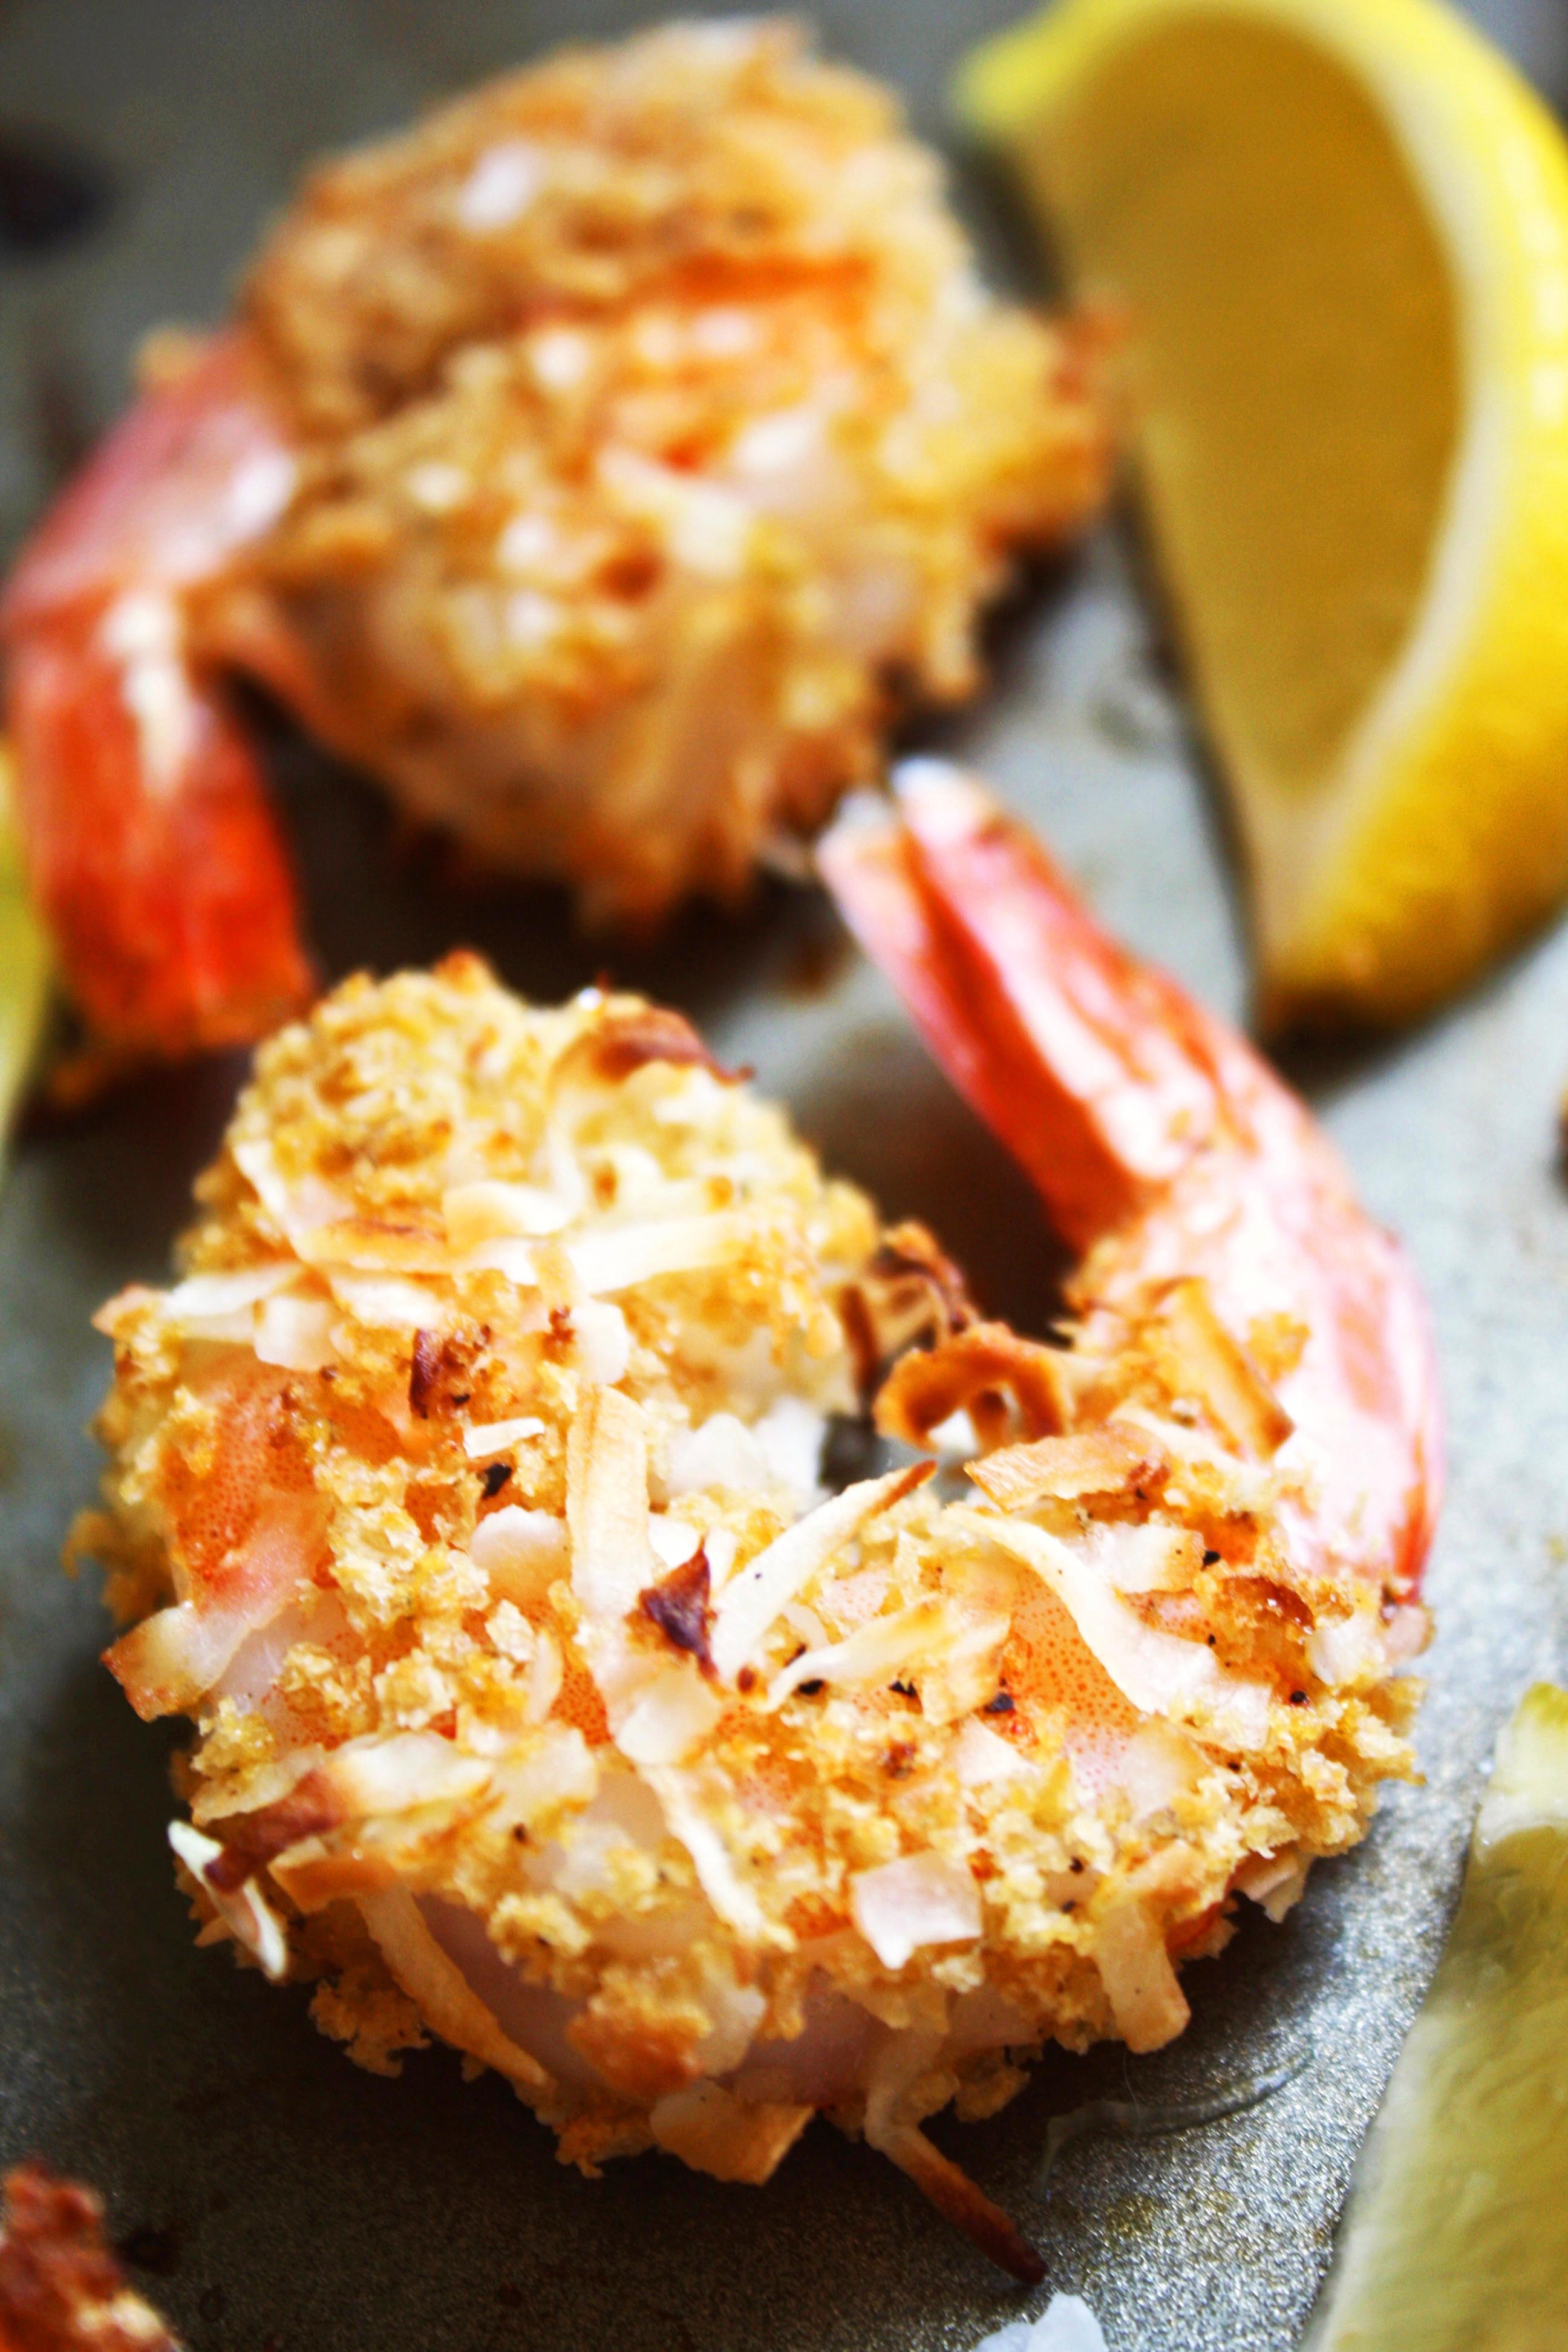 Coconut Shrimp Recipes  Baked Coconut Shrimp [21 Day Fix]